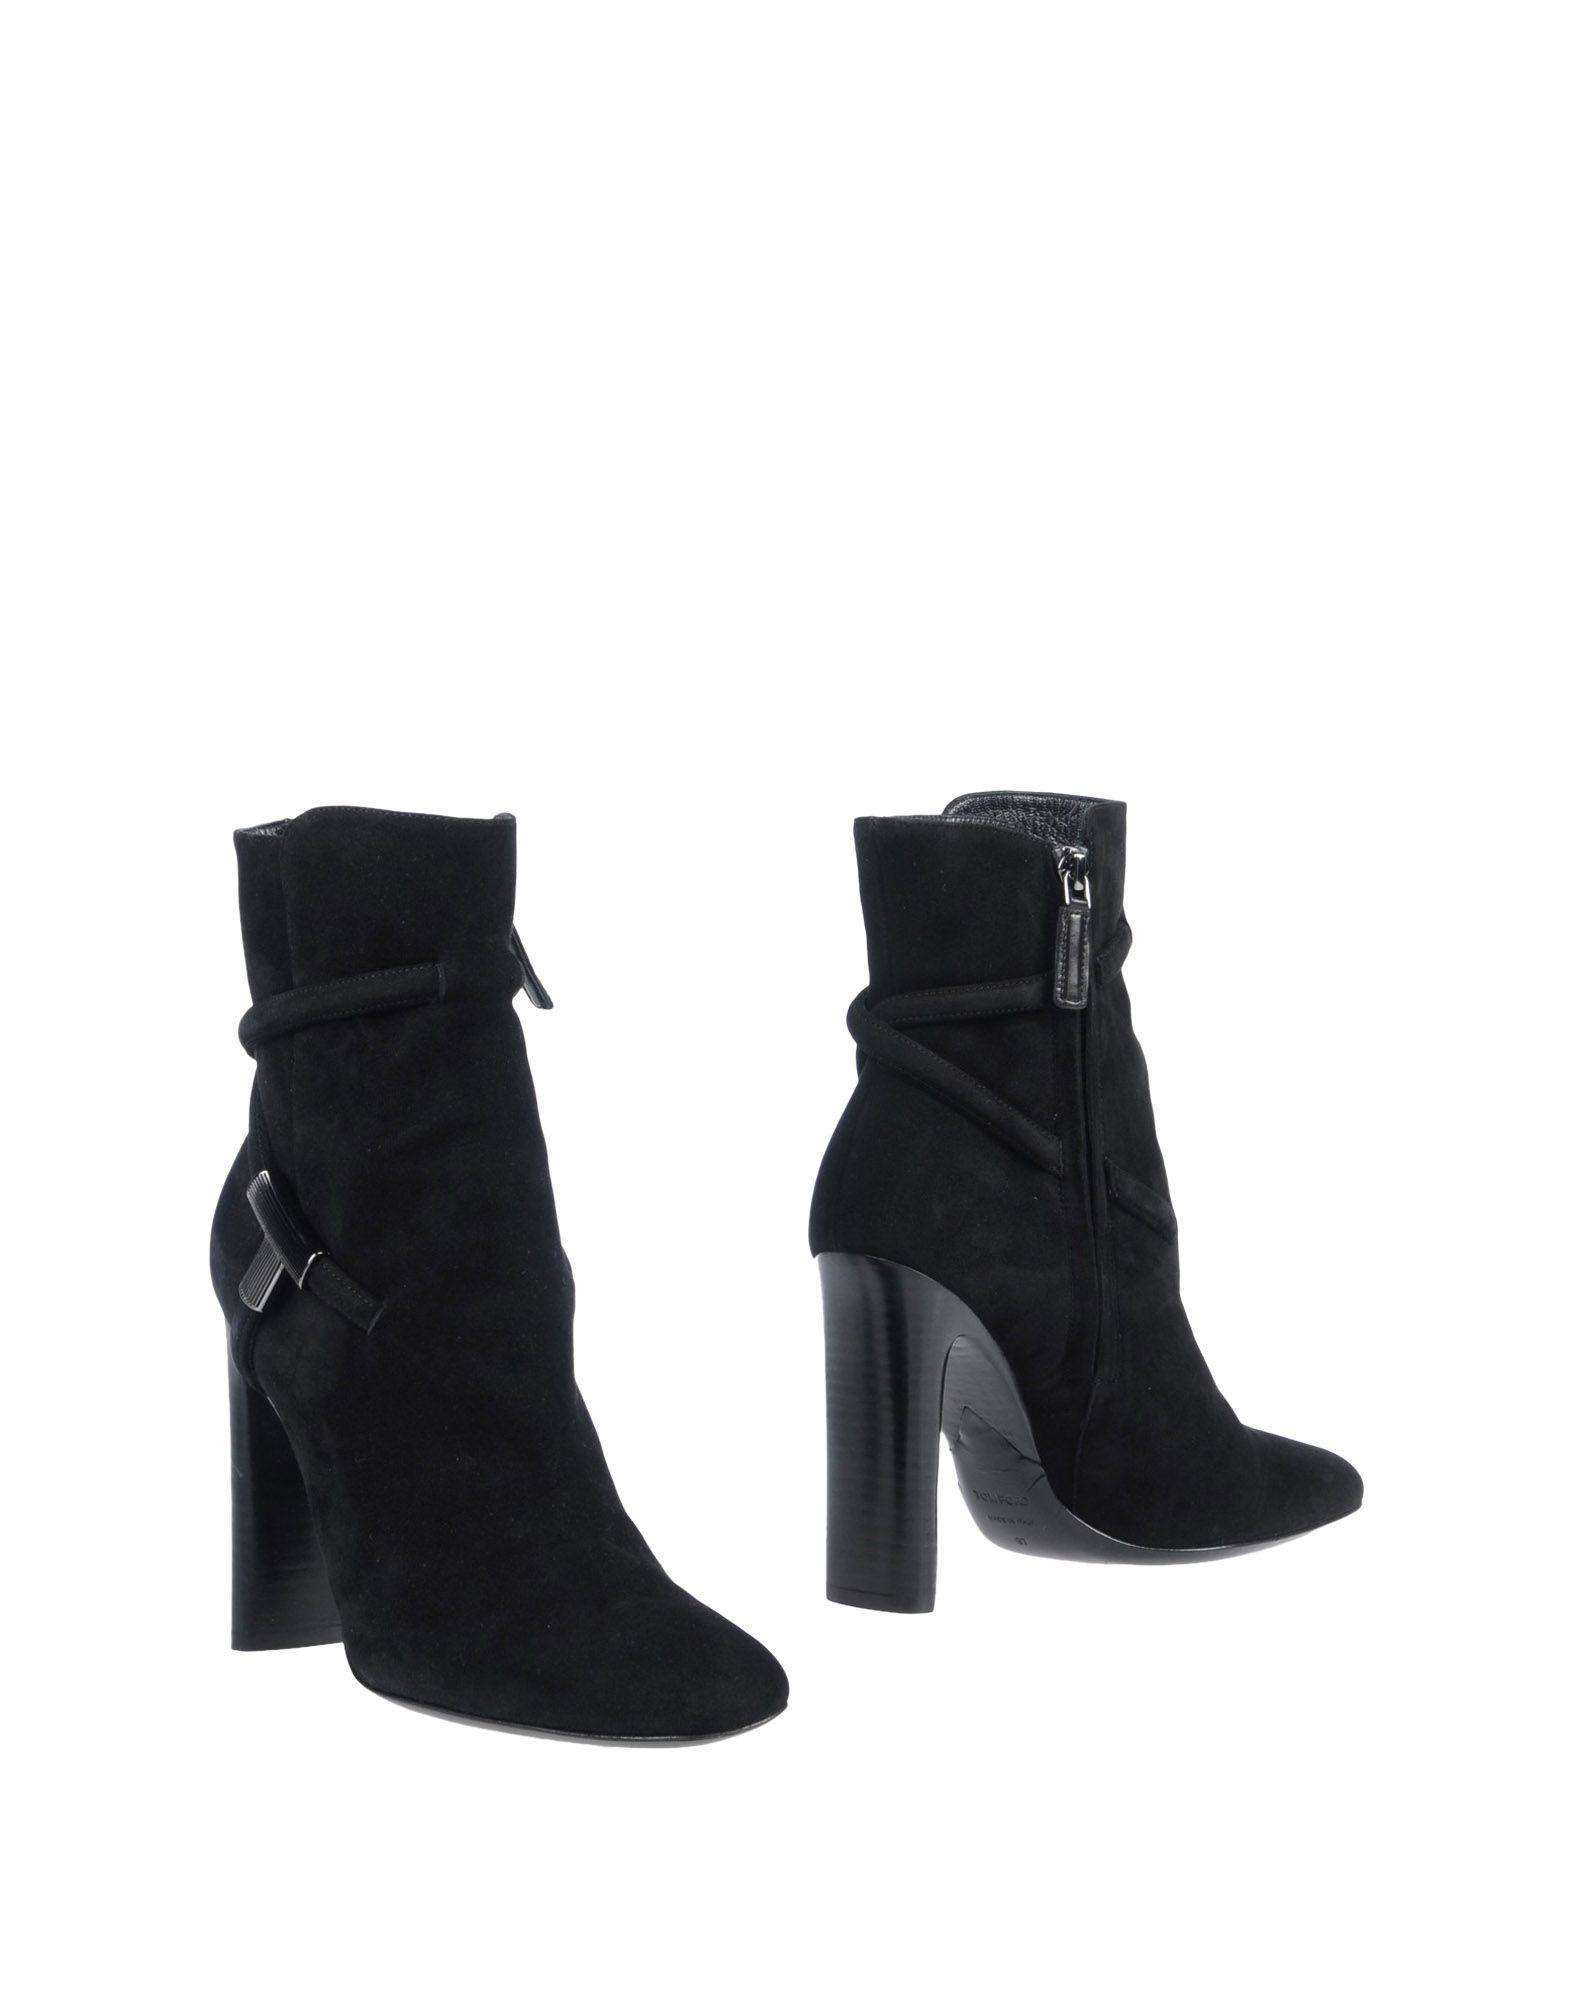 Tom Ford Stiefelette Schuhe Damen  11430025OB Neue Schuhe Stiefelette 49fecb